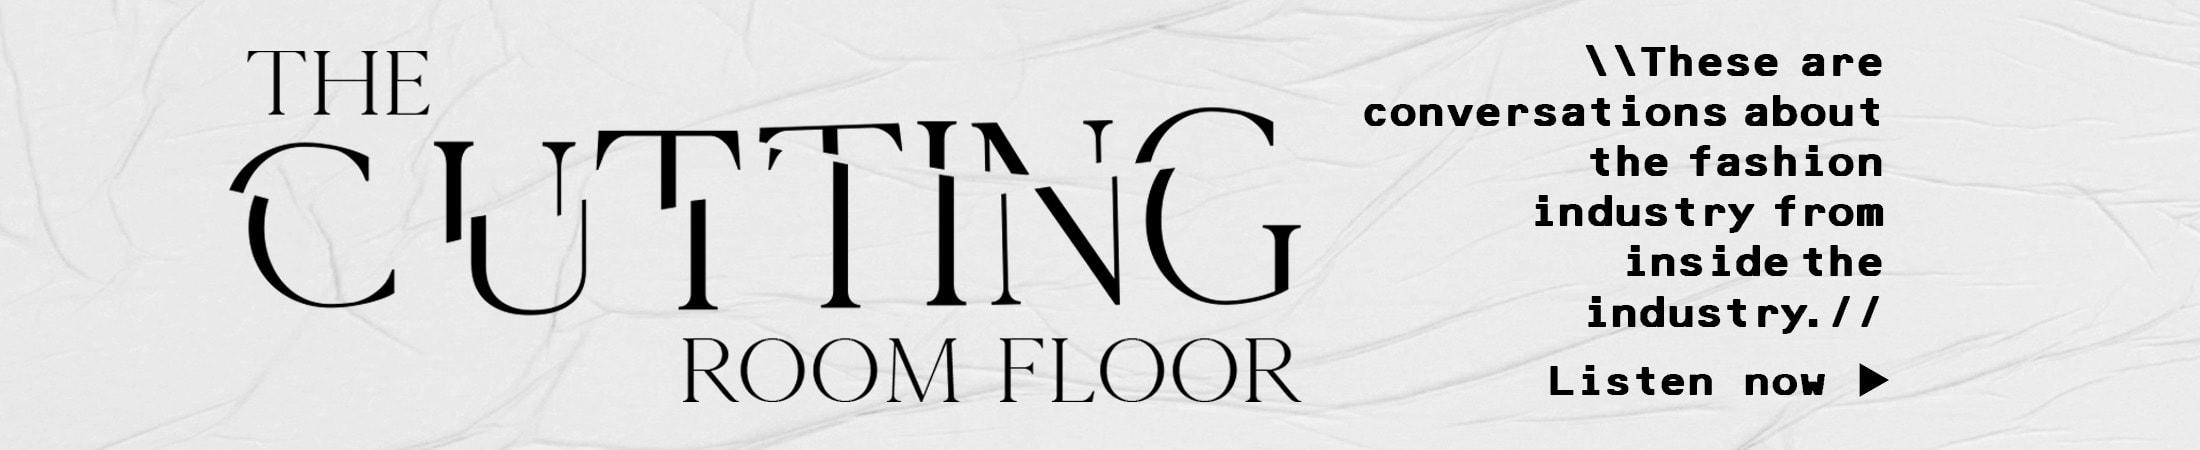 the-cutting-room-floor-podcast.jpg